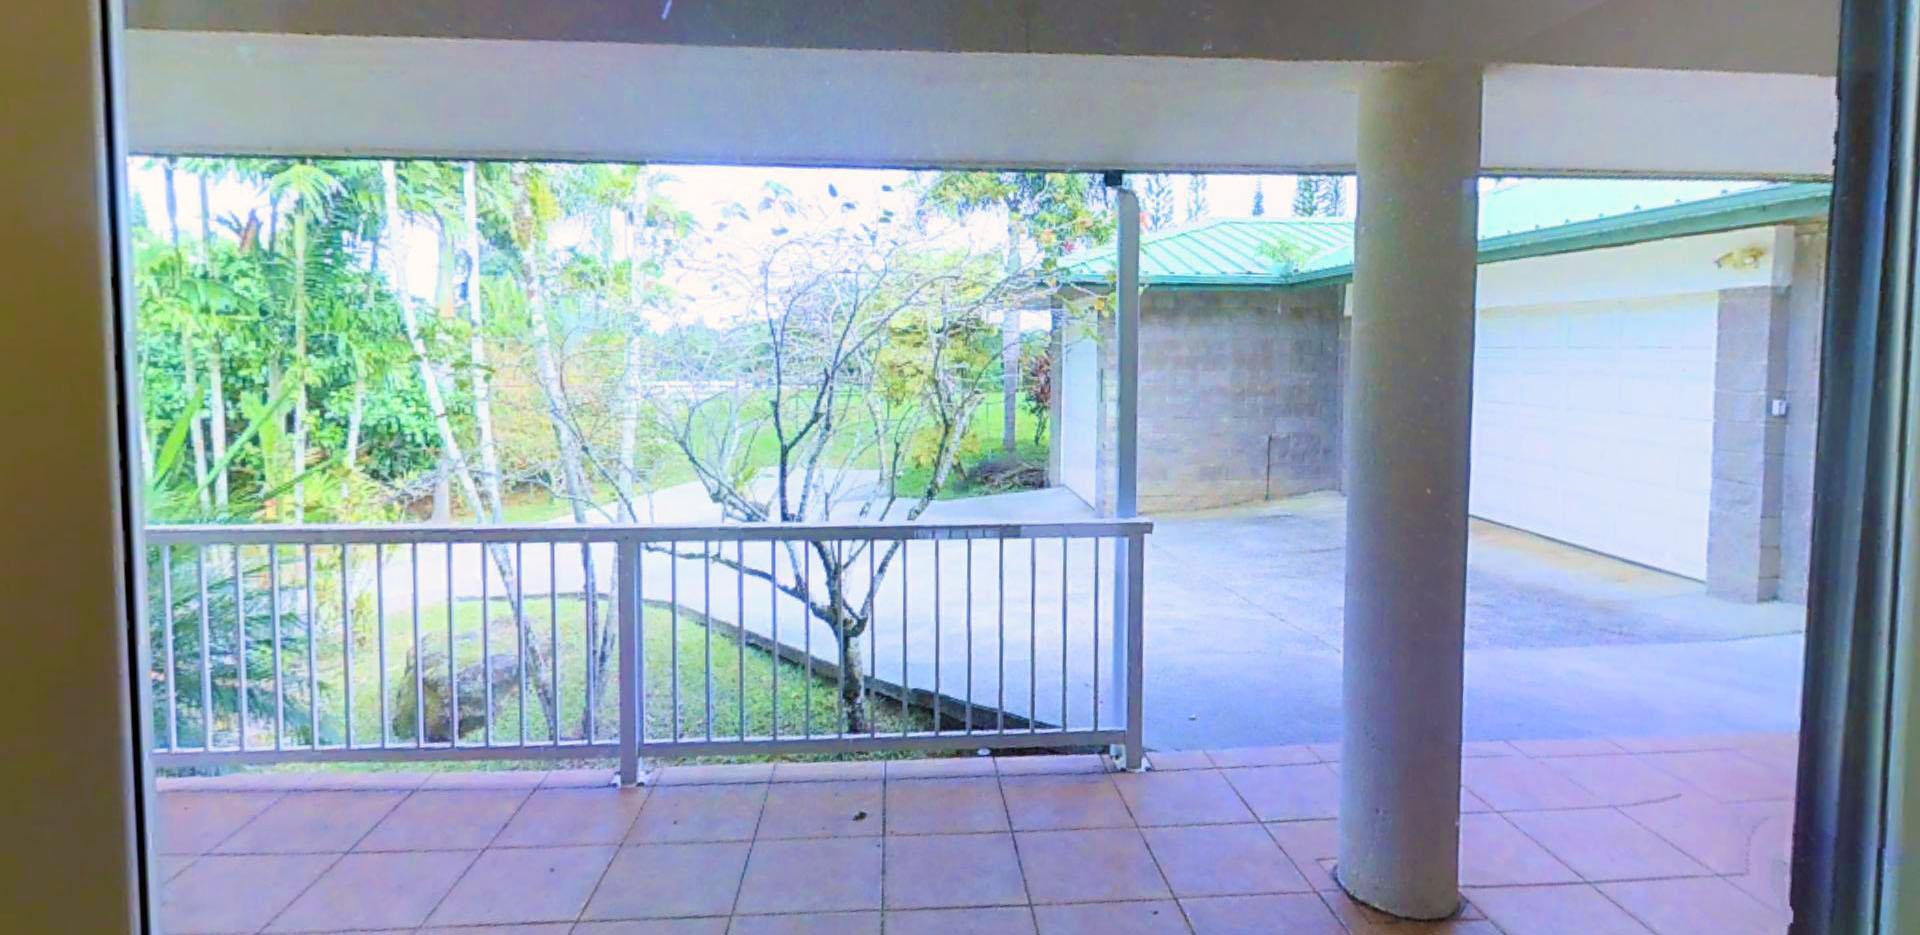 princeville ranch home sold on acreage 4875 kapaka